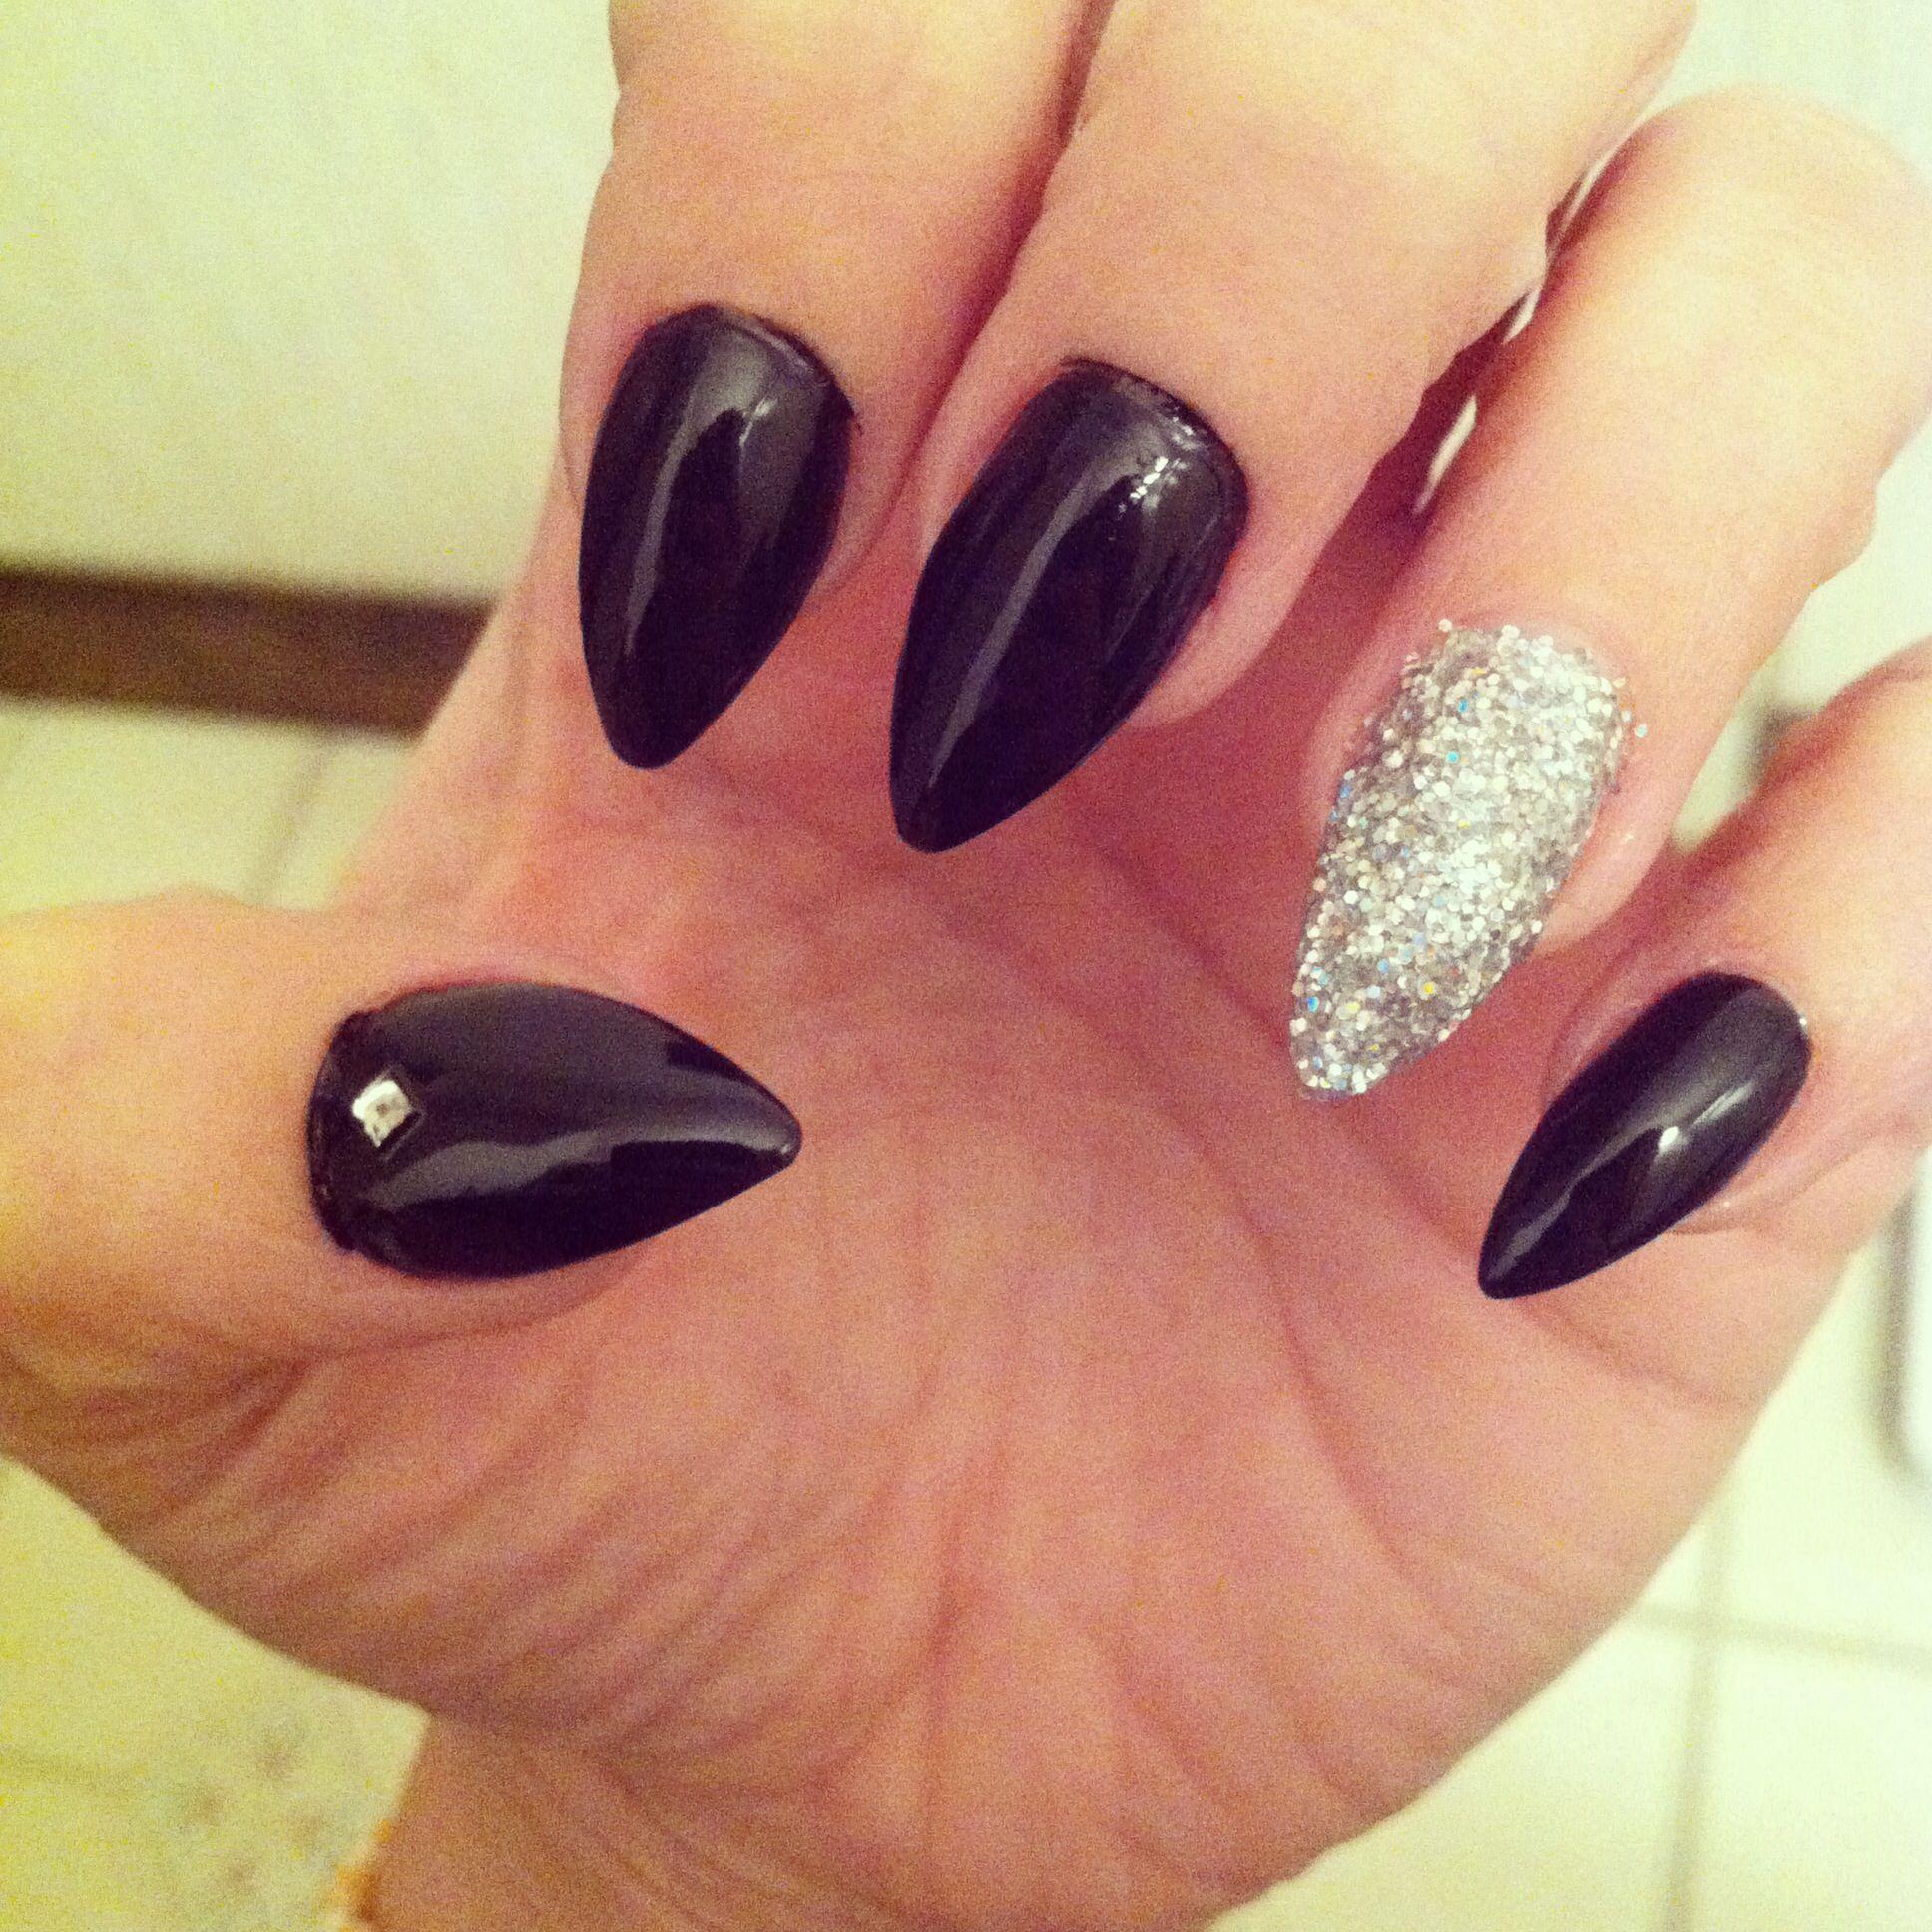 Black and silver stiletto nails | Nails | Pinterest ...